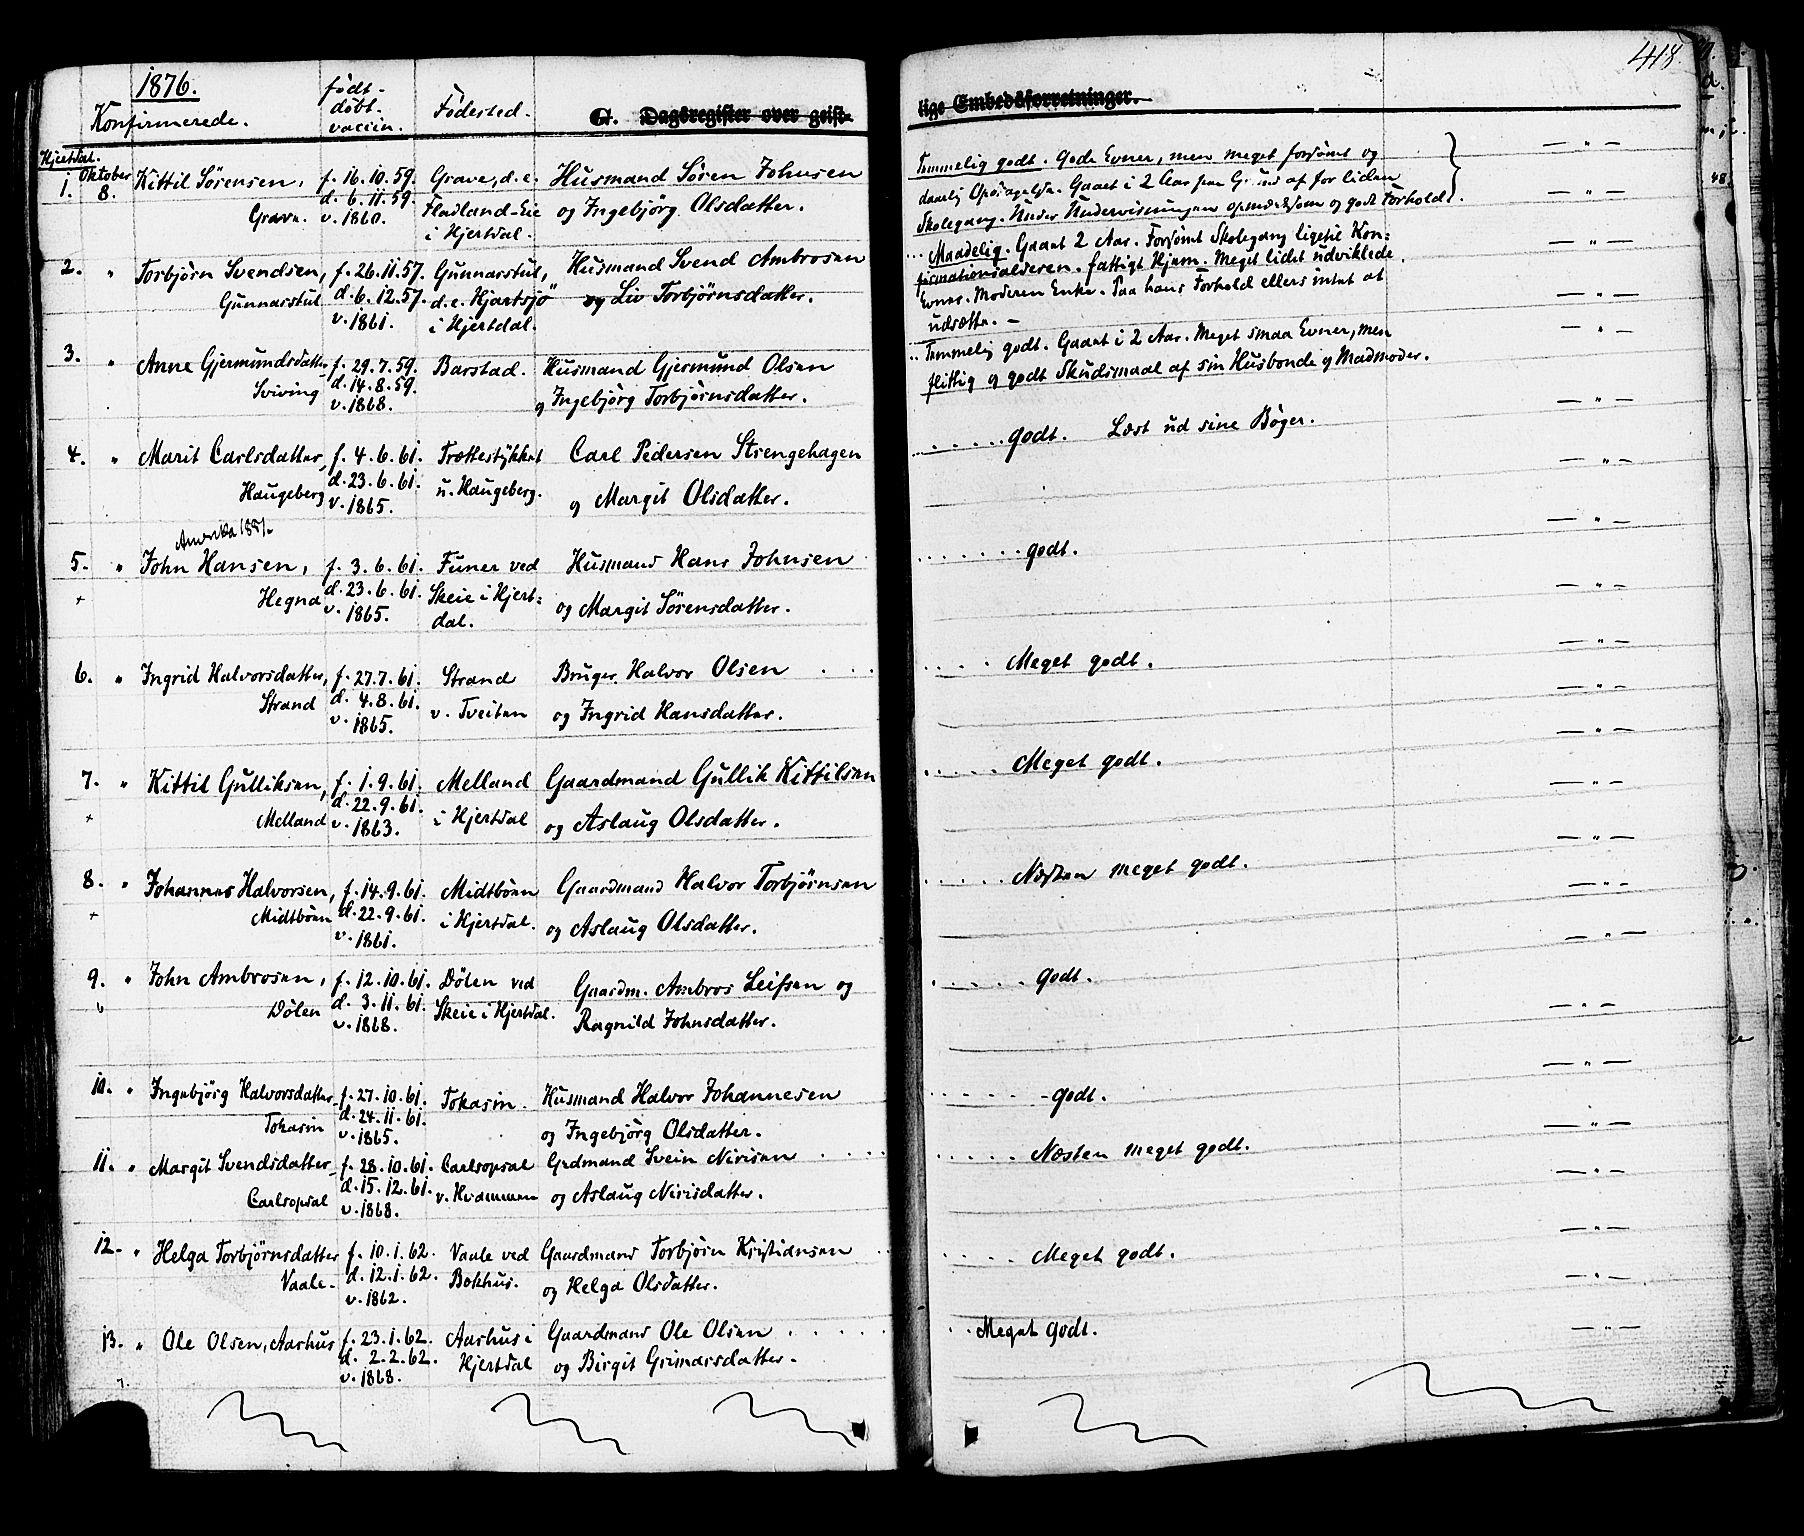 SAKO, Hjartdal kirkebøker, F/Fa/L0009: Ministerialbok nr. I 9, 1860-1879, s. 418